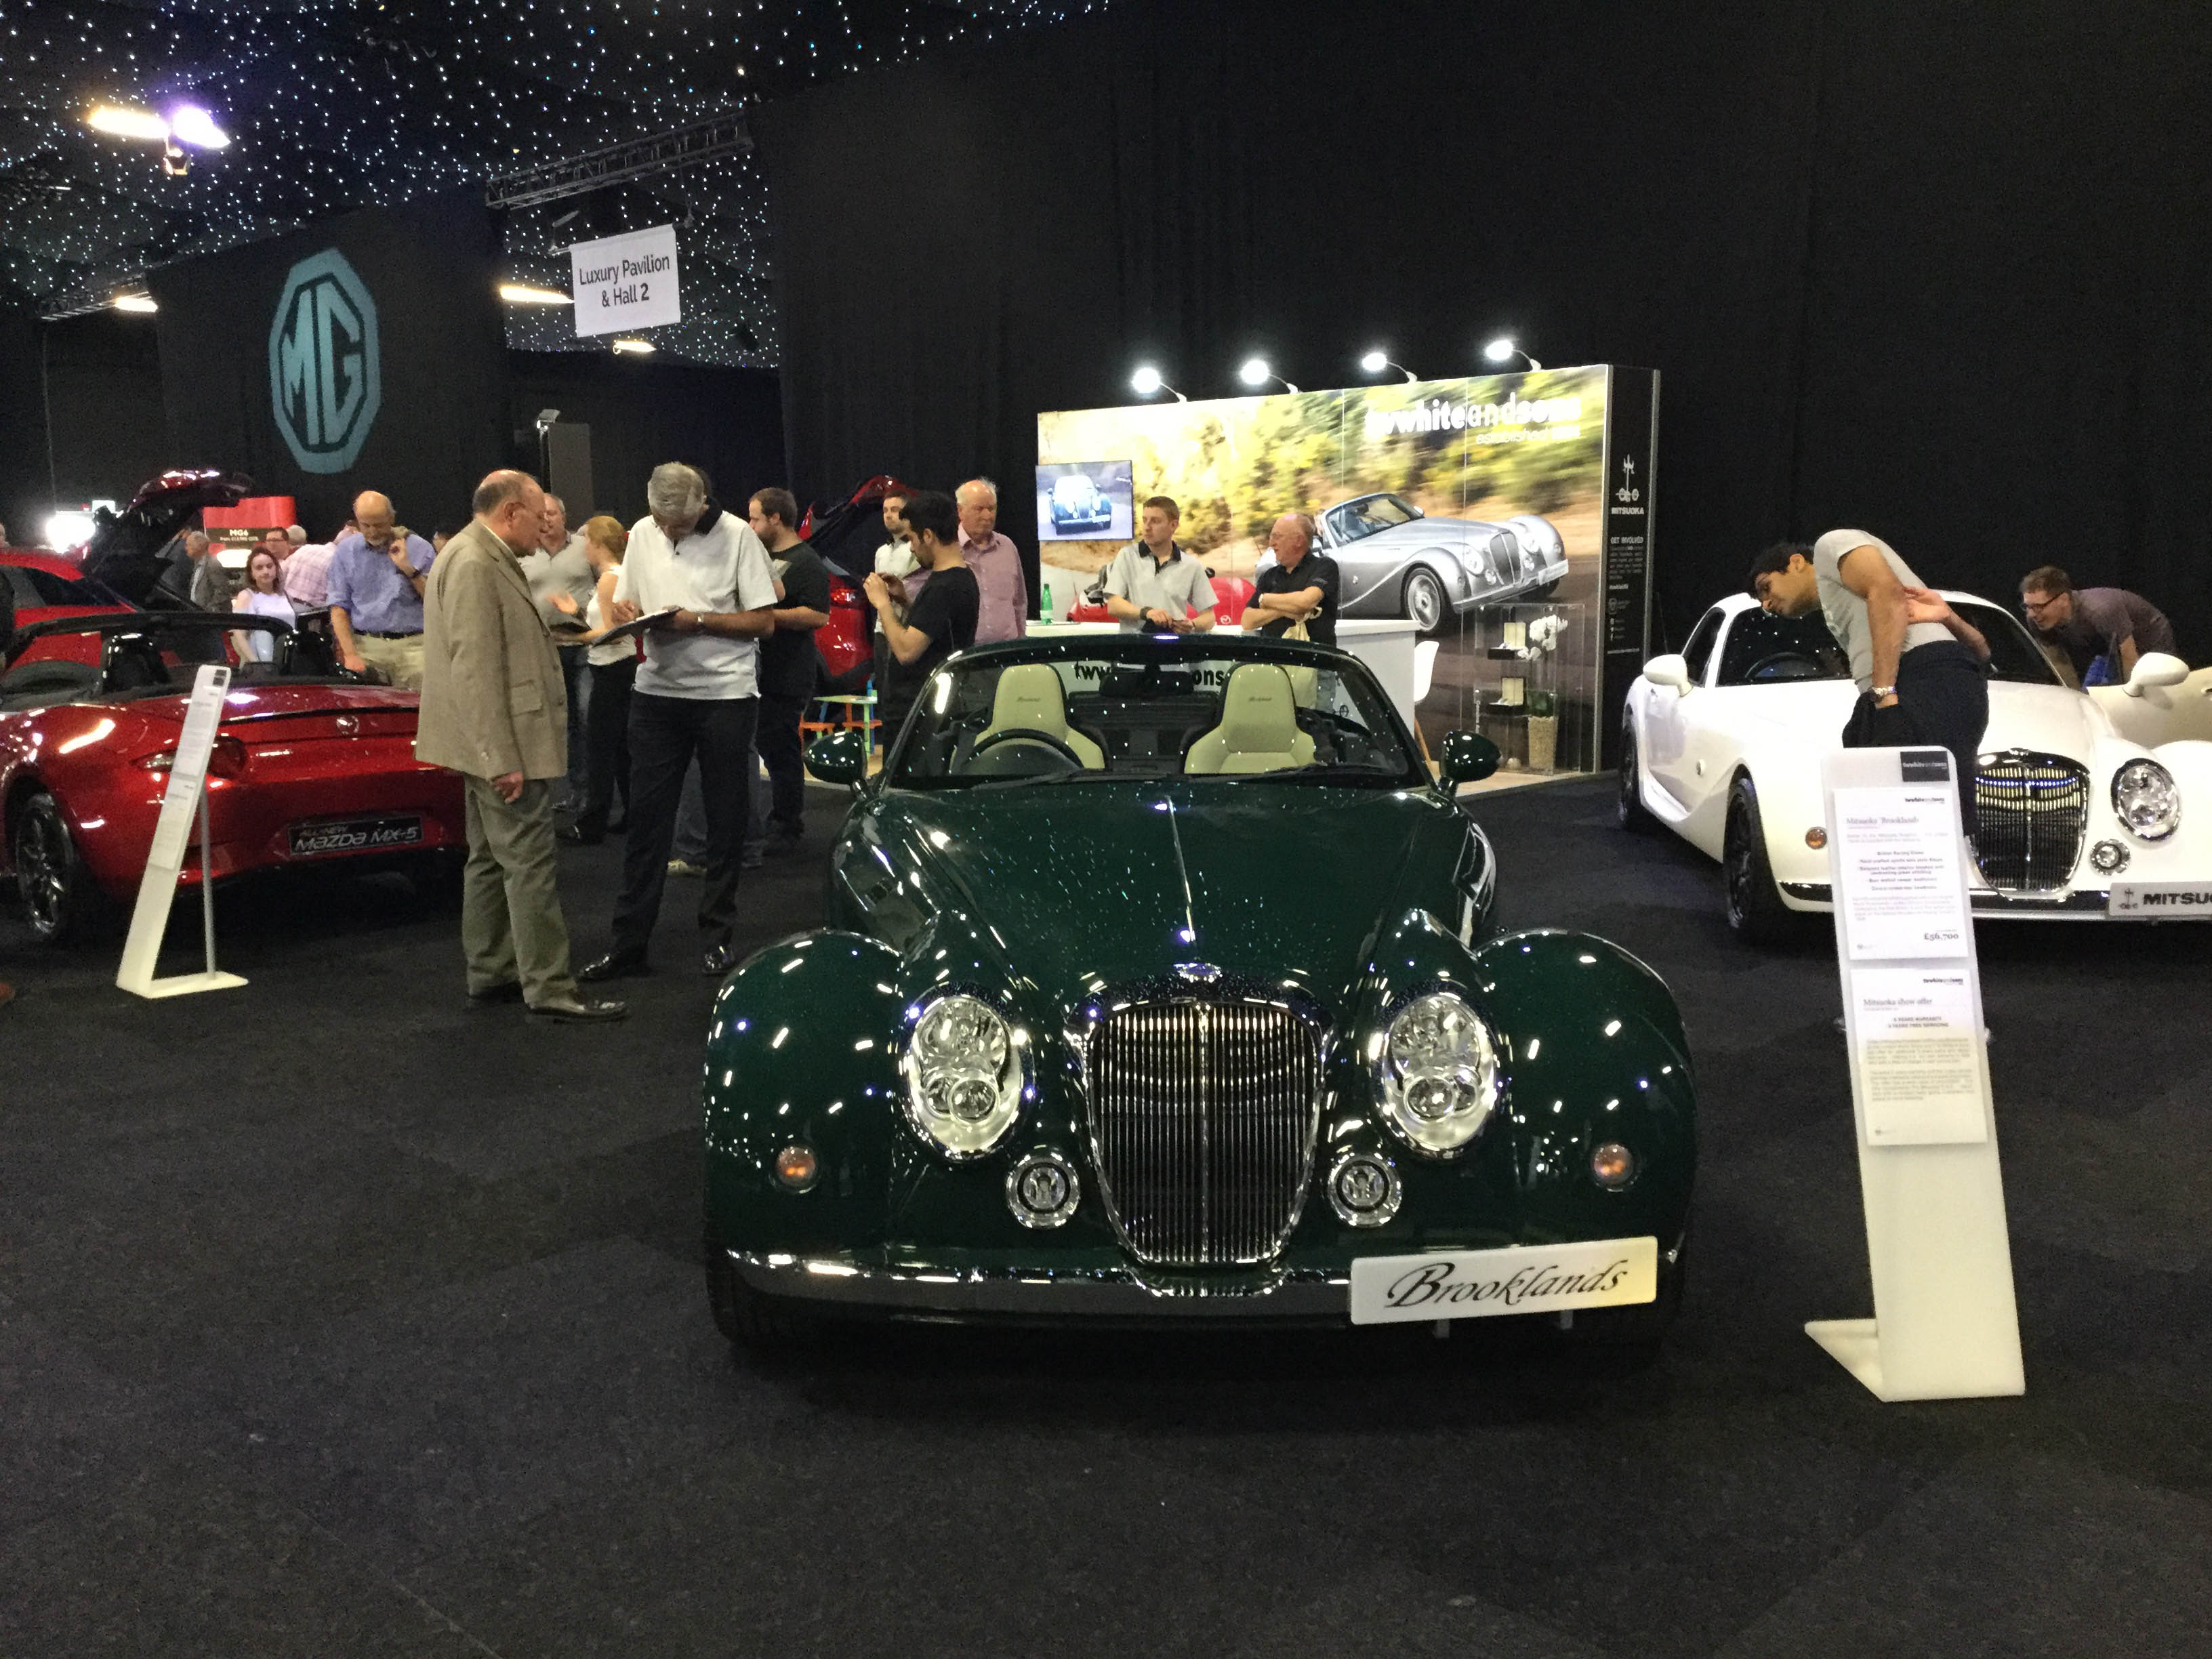 Mitsuoka Brooklands at the London Motor Show